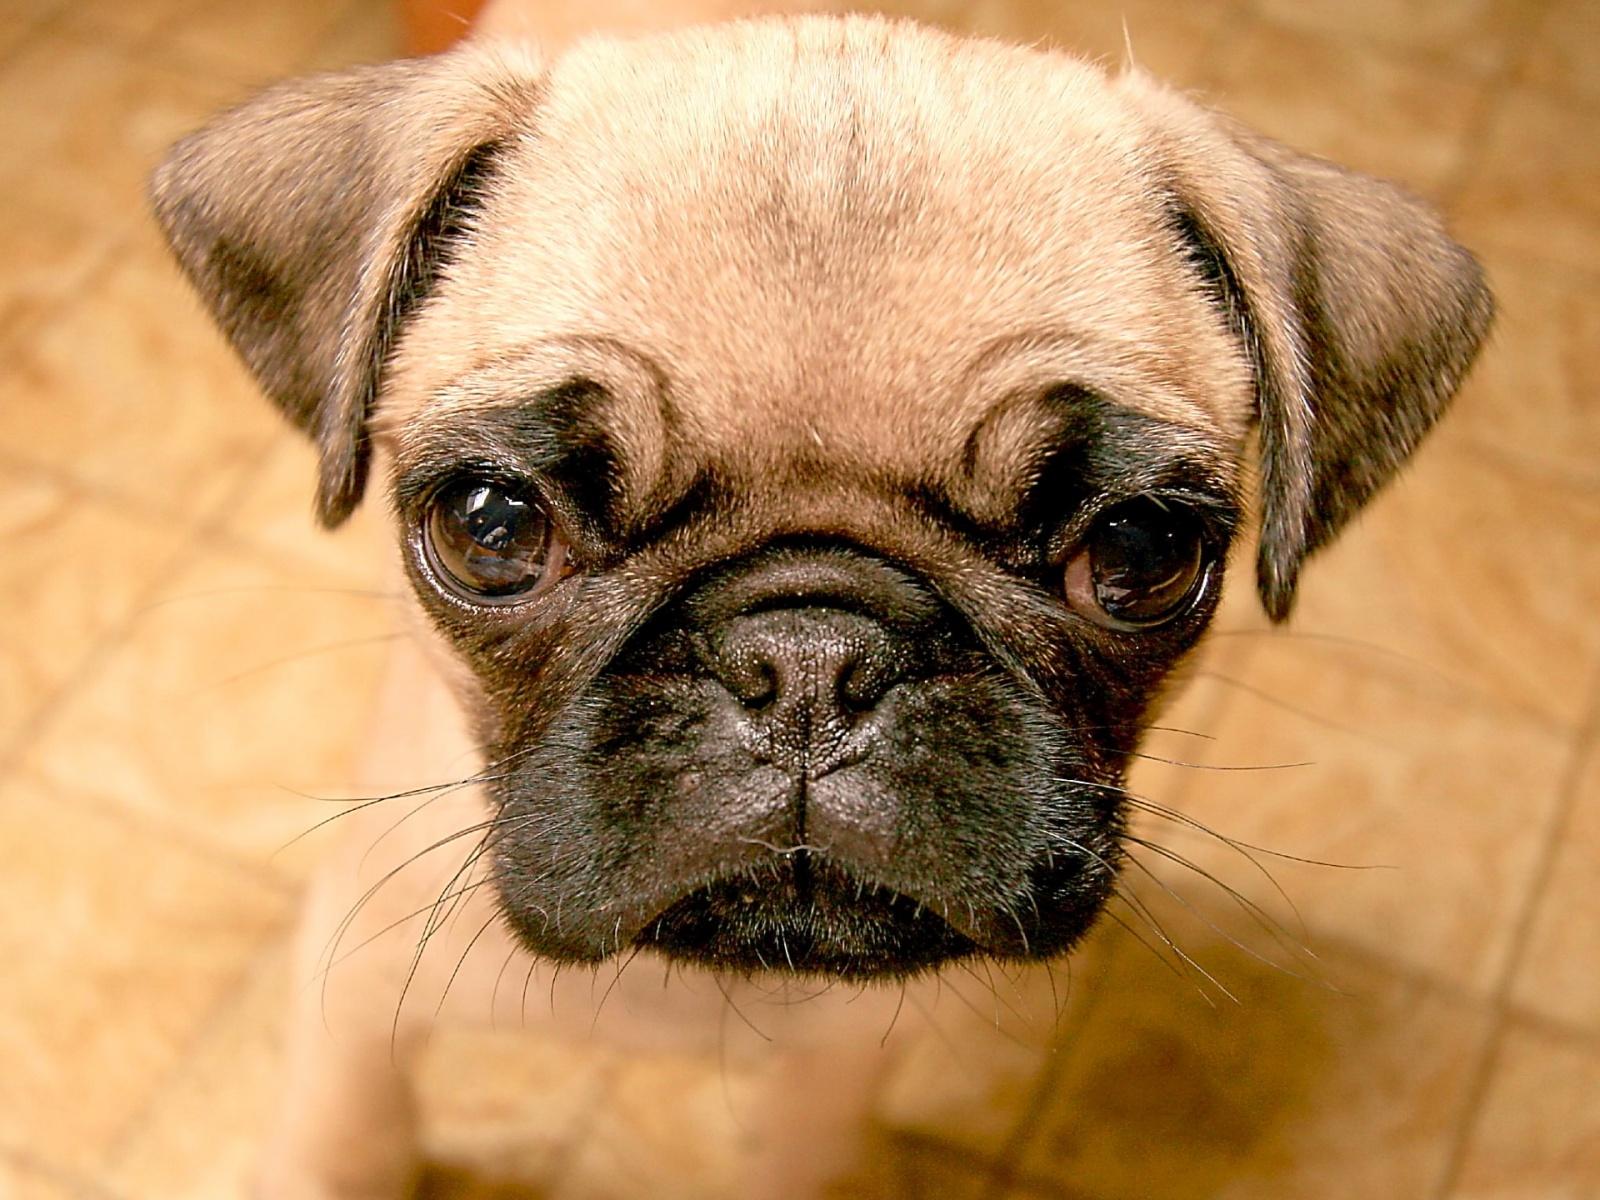 Fond D Ecran Chien Triste Full Breed Pug Puppy 1556857 Hd Wallpaper Backgrounds Download